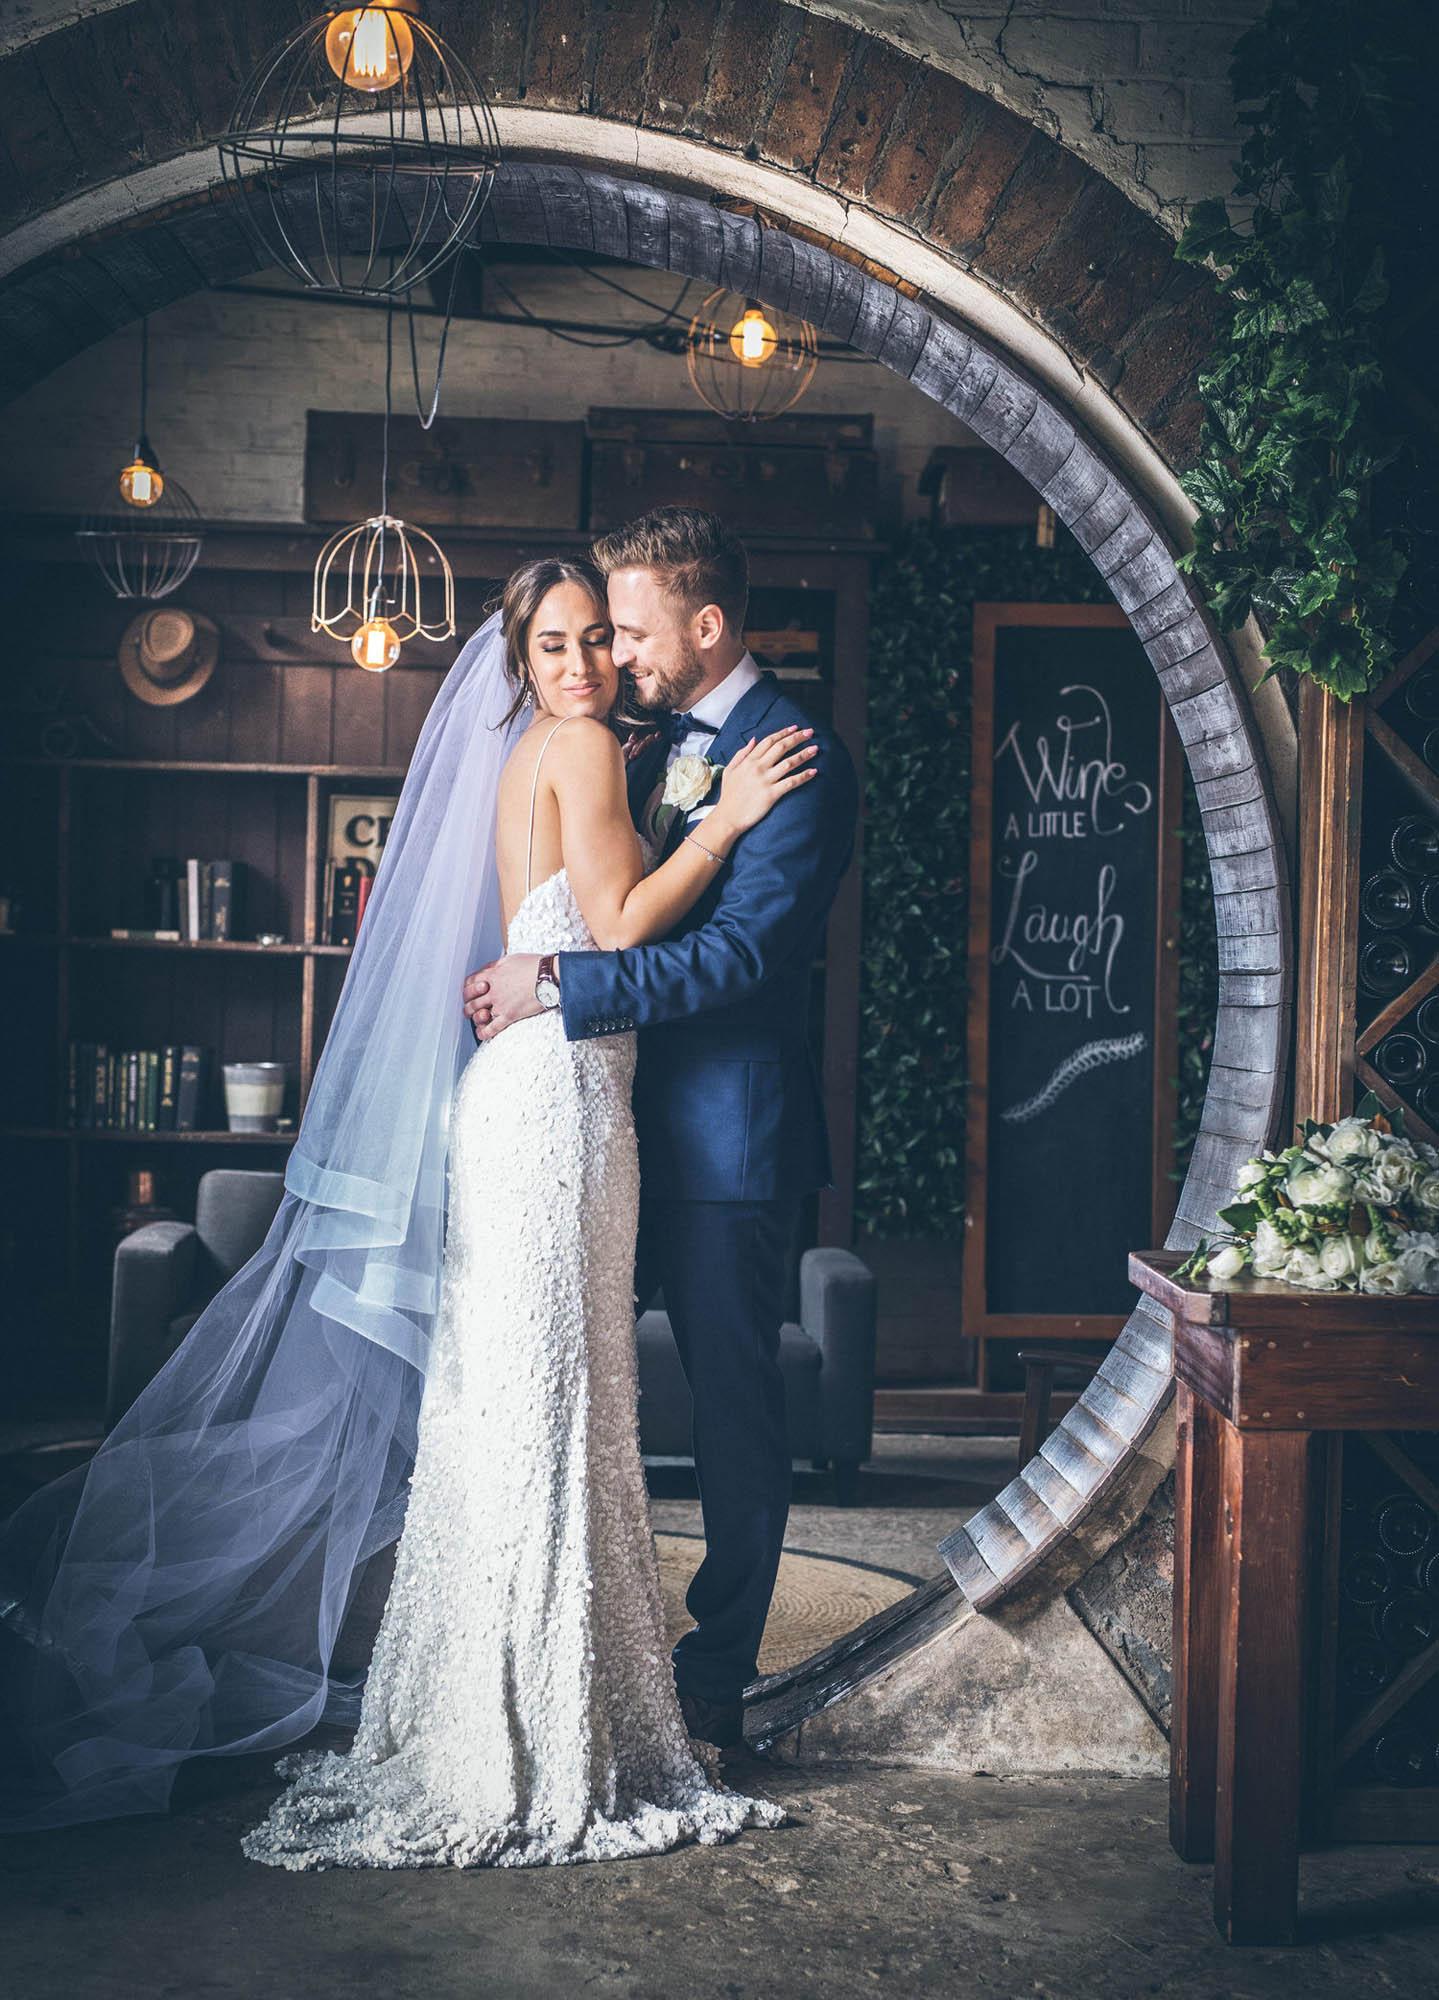 MacDougall-Photography-Sydney-Wedding-Photographers-68.jpg